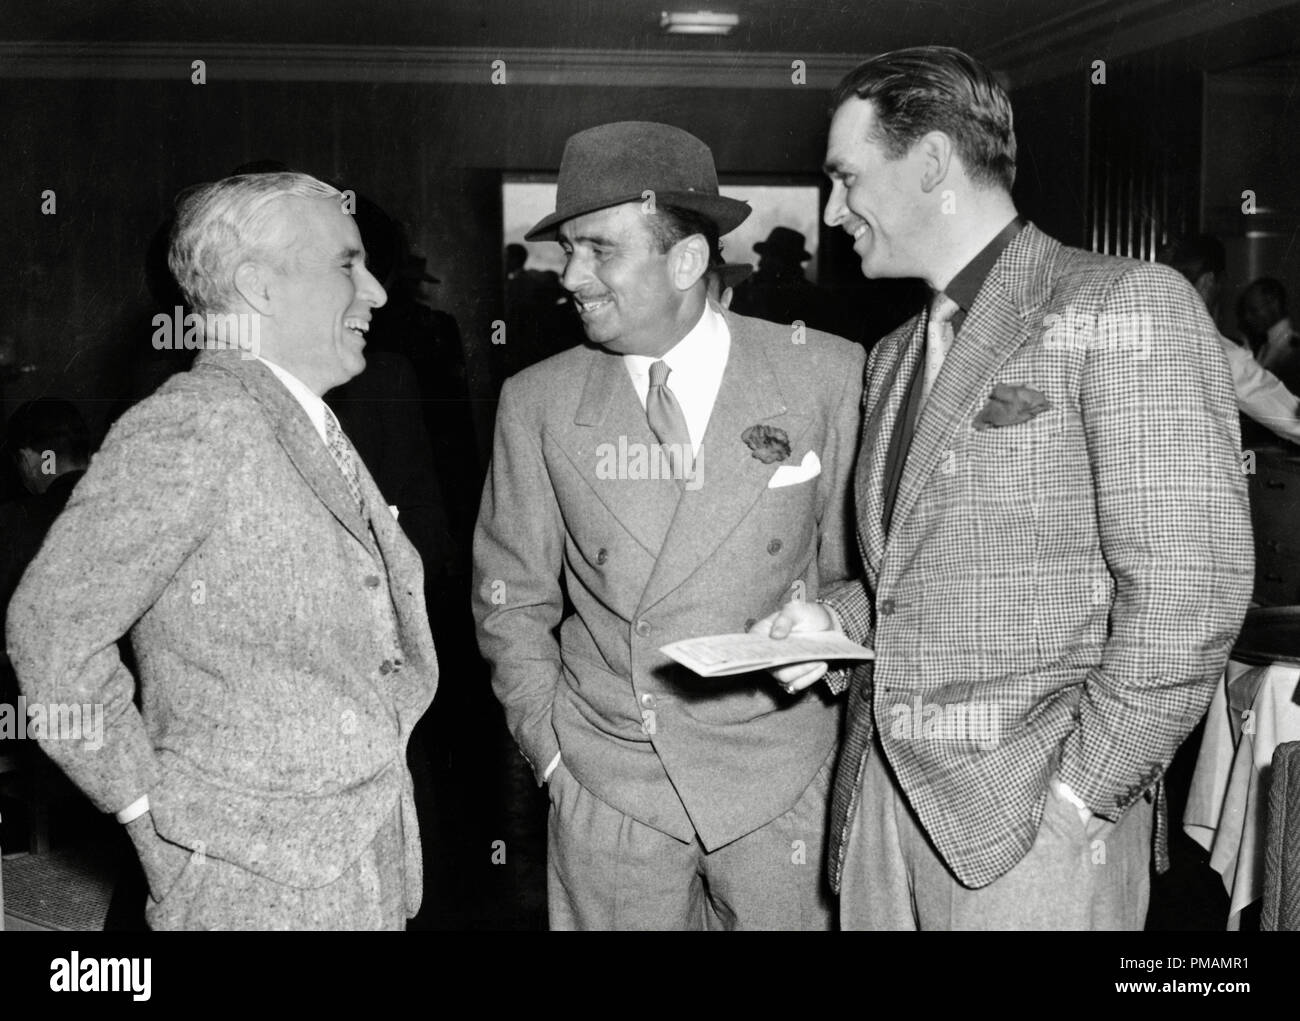 Charles Chaplin, Douglas Fairbanks Sr. and  Douglas Fairbanks Jr., 1939  File Reference # 33505_006THA - Stock Image